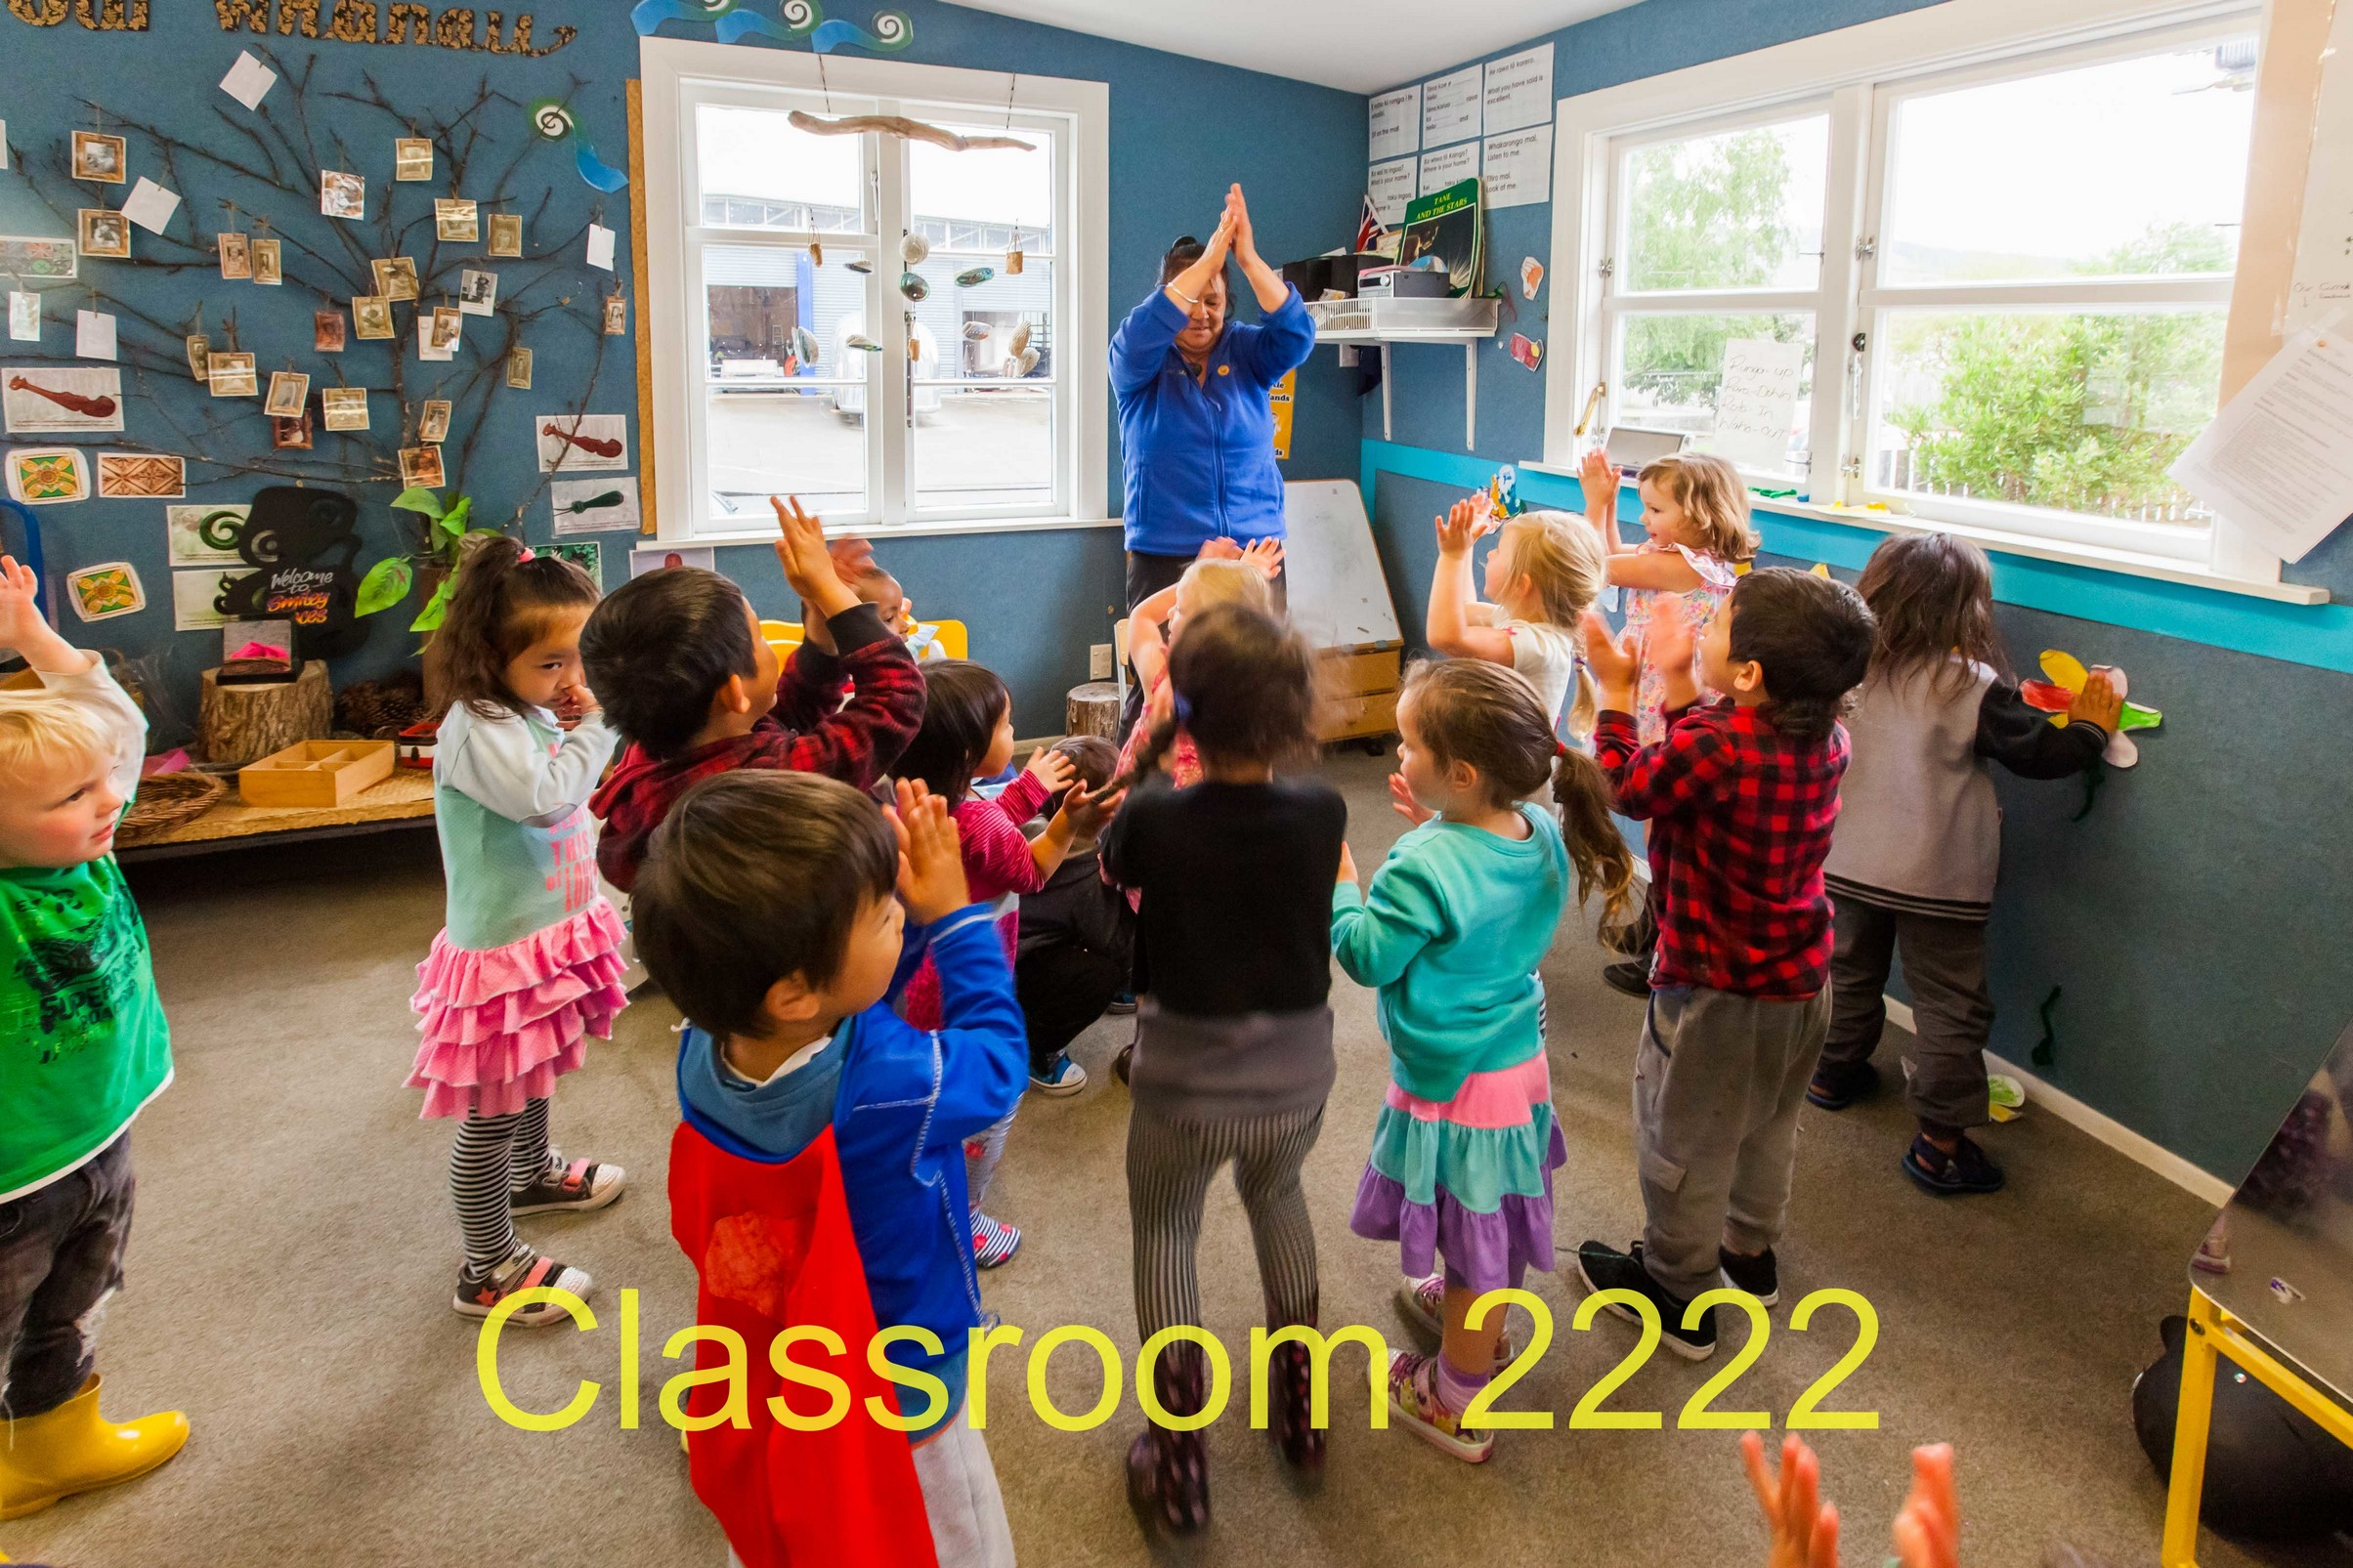 Classroom 2222